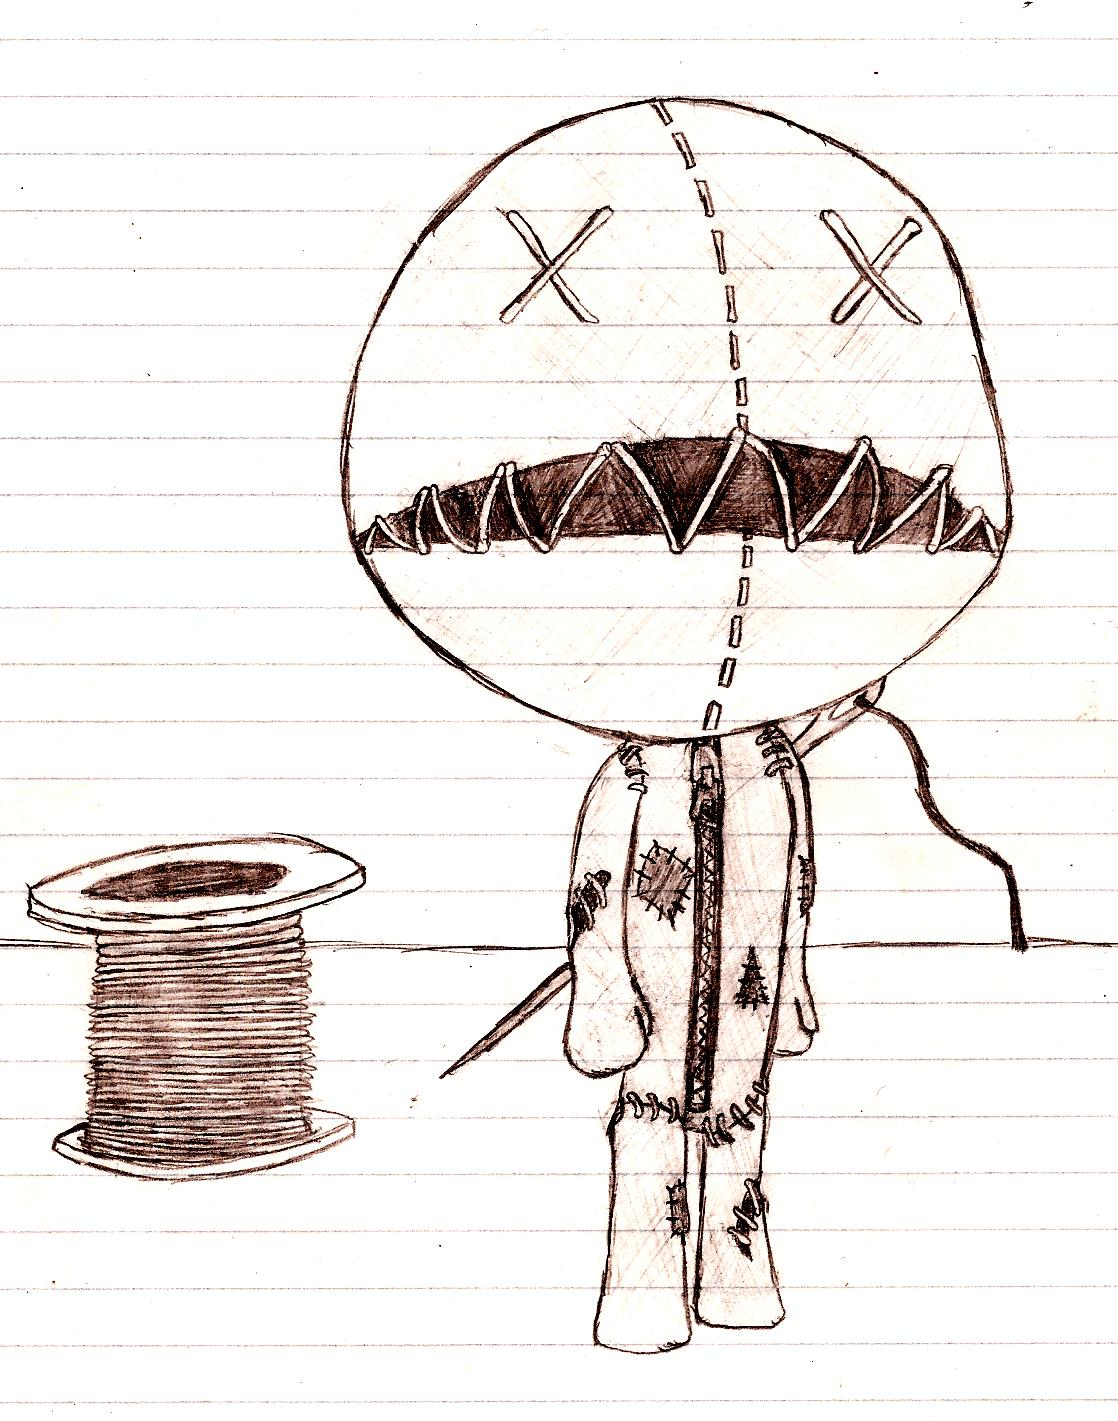 Voodoo Doll By Jmoney2495 On DeviantArt